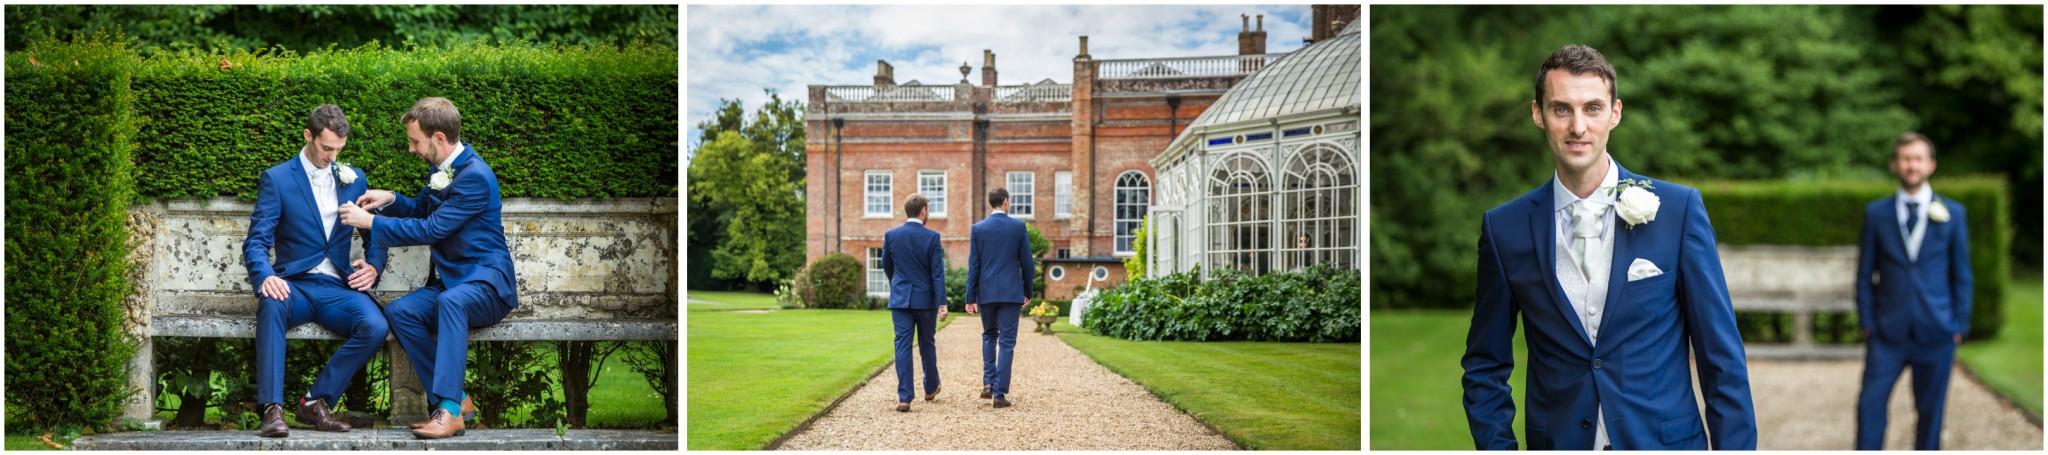 Avington Park Wedding Groom with Best Man in gardens